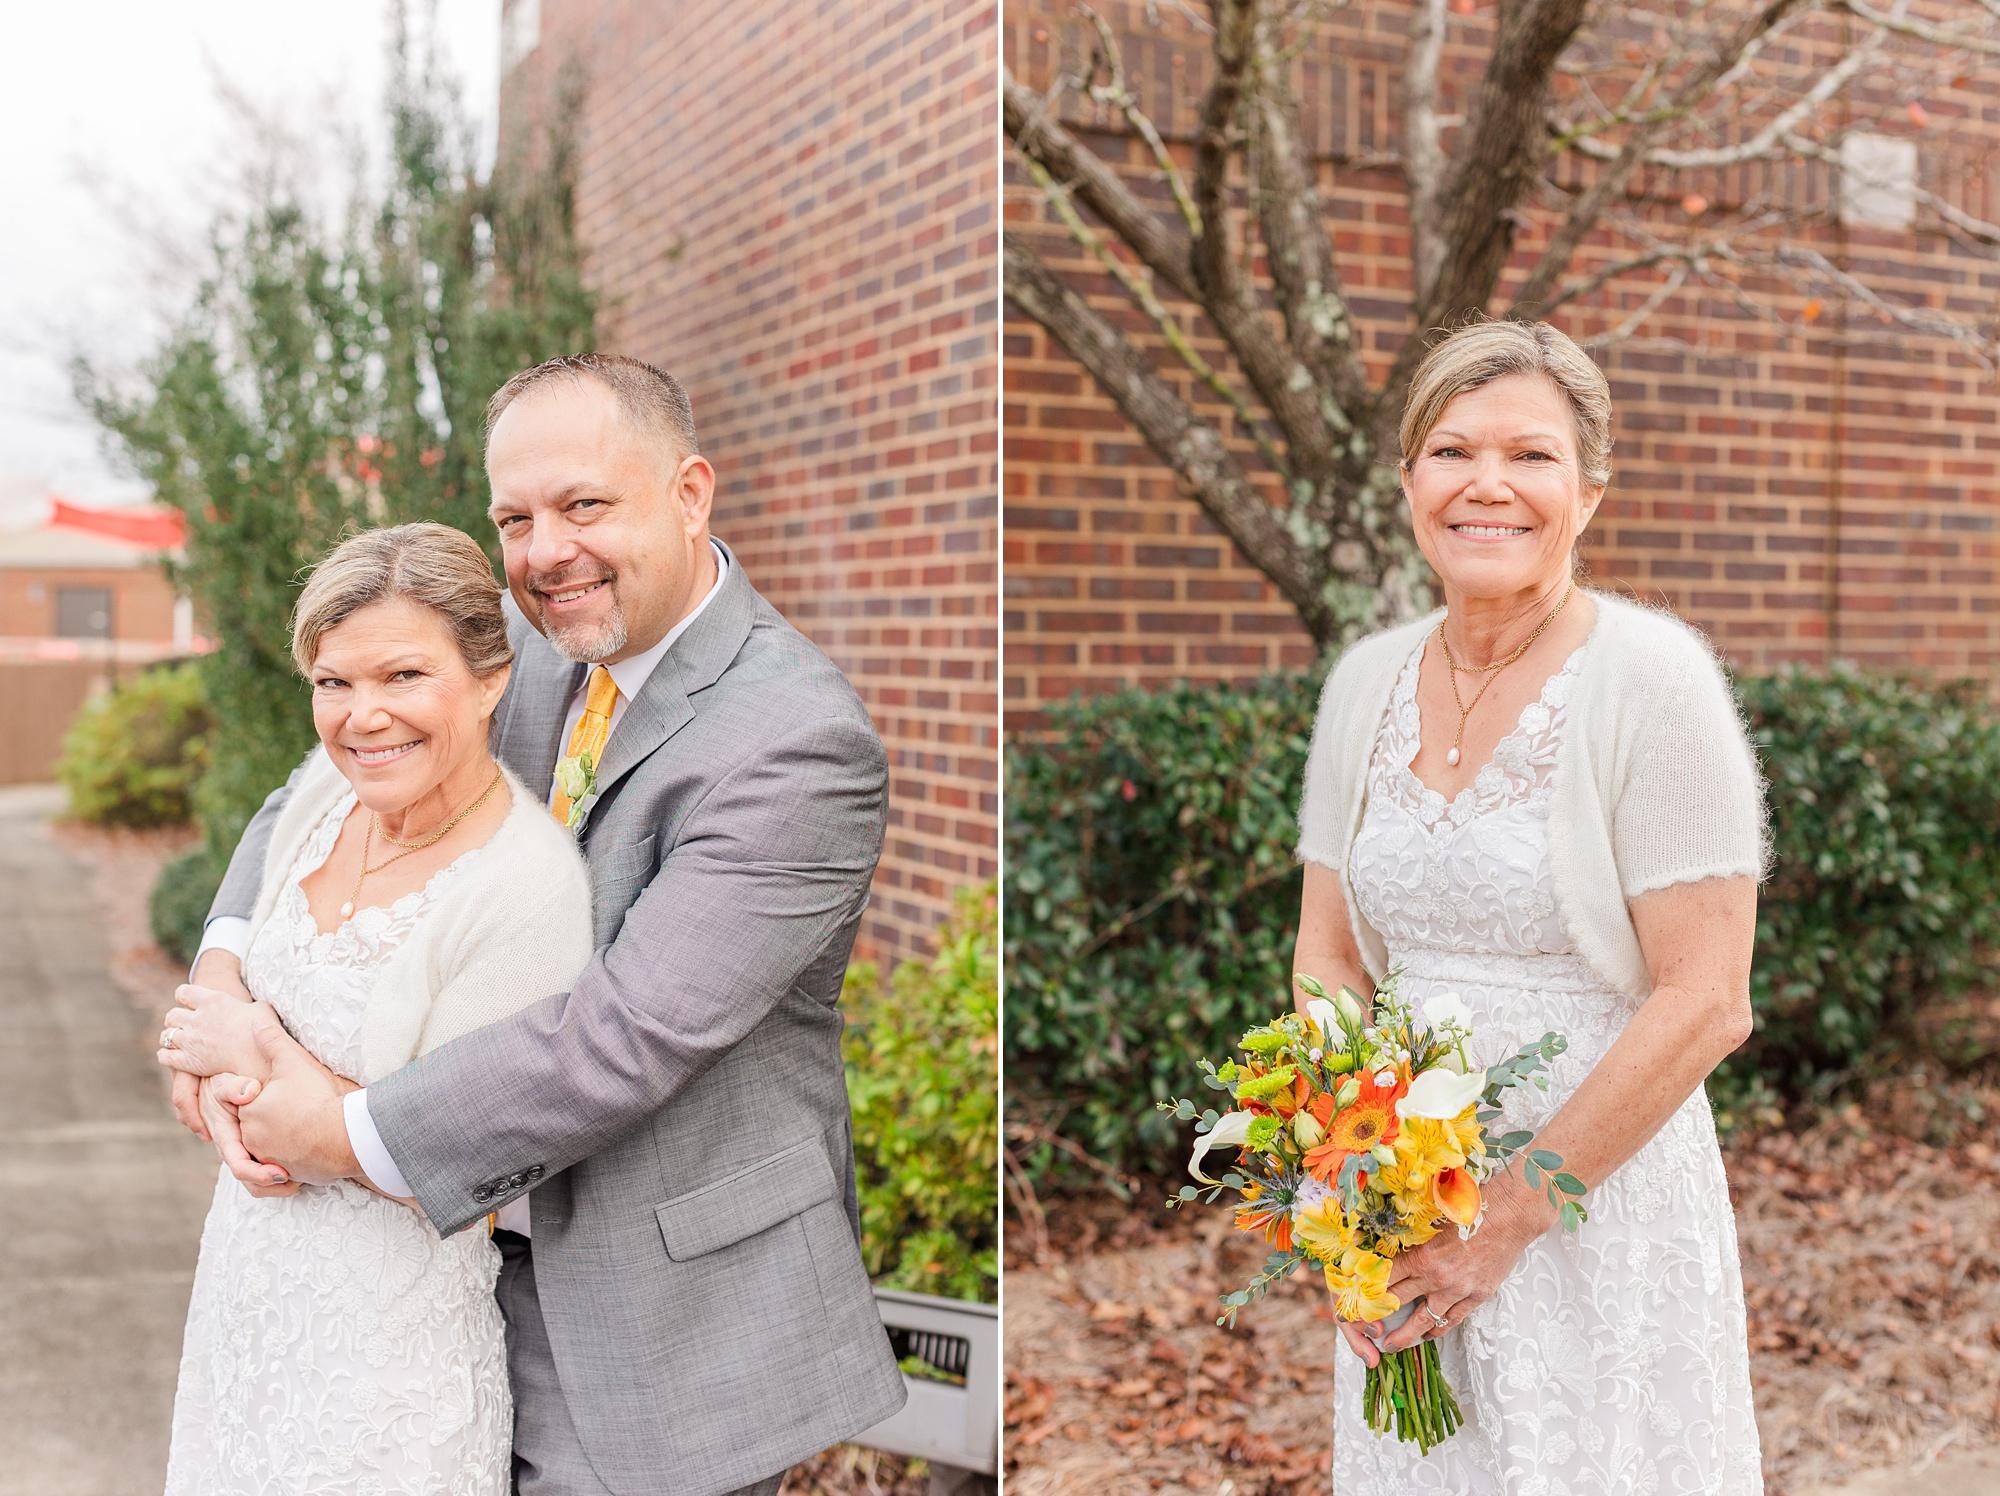 Alabama couple hugs during portraits on wedding day